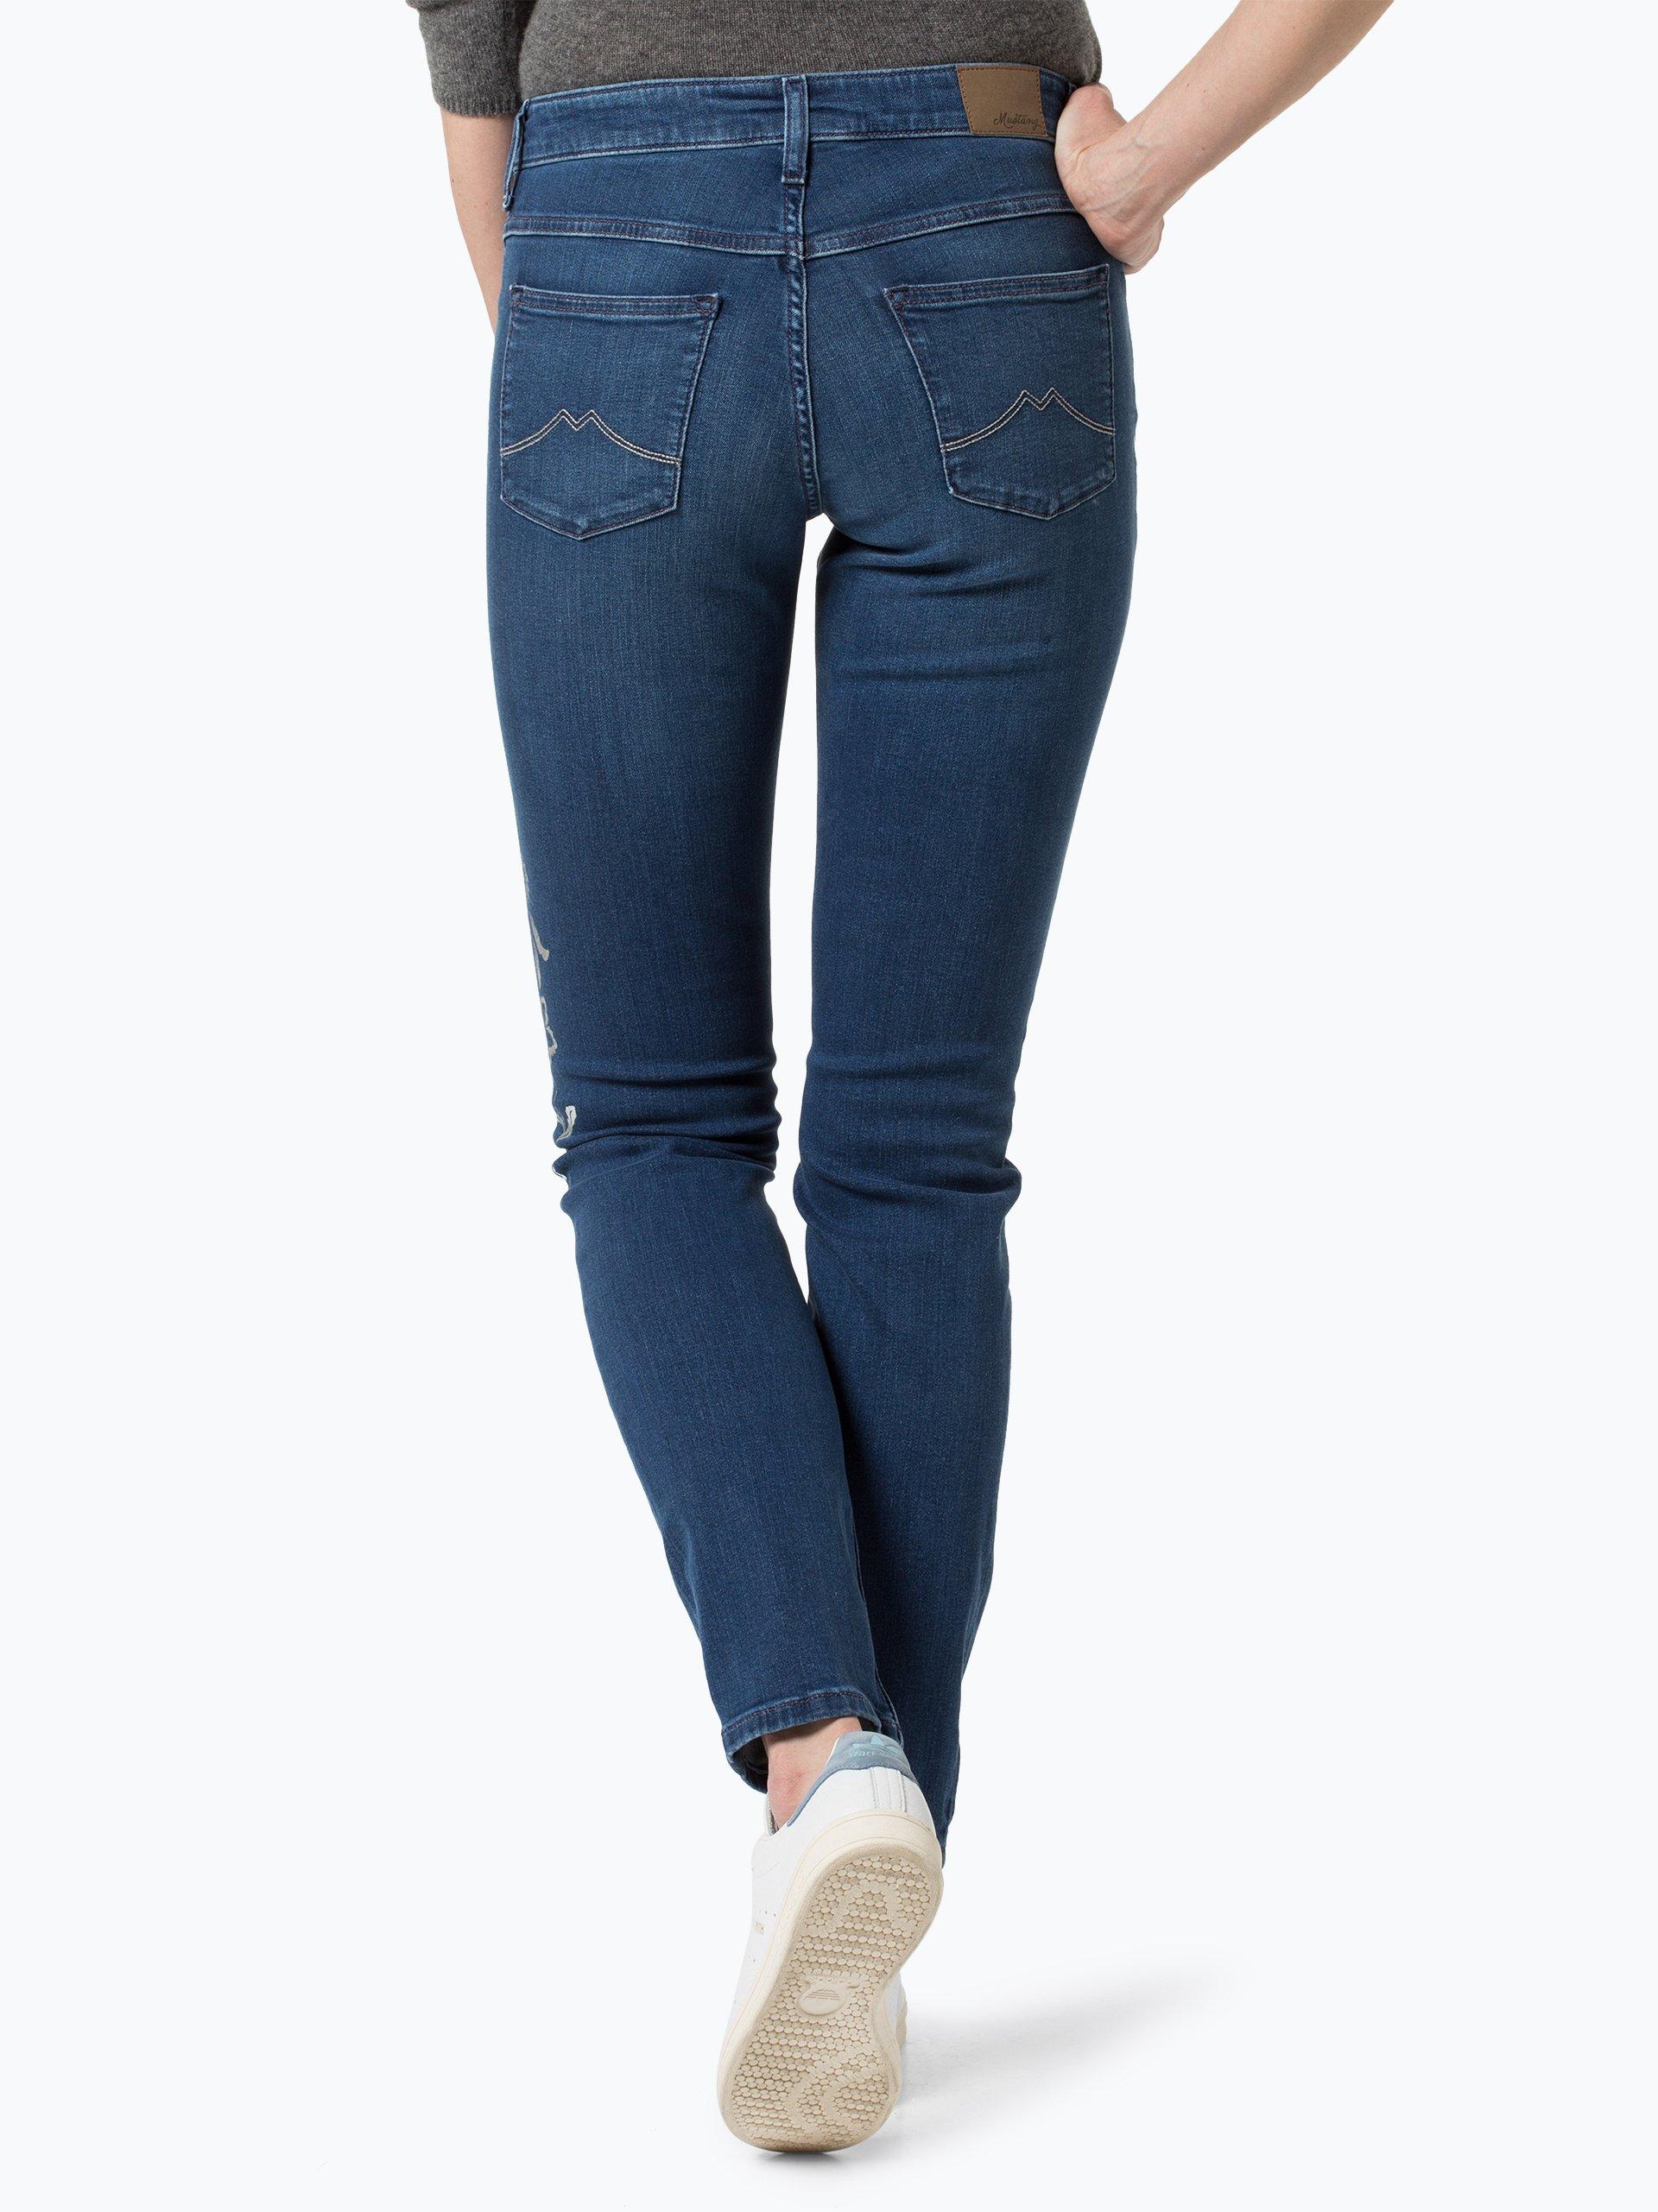 Mustang Damen Jeans - Sissy